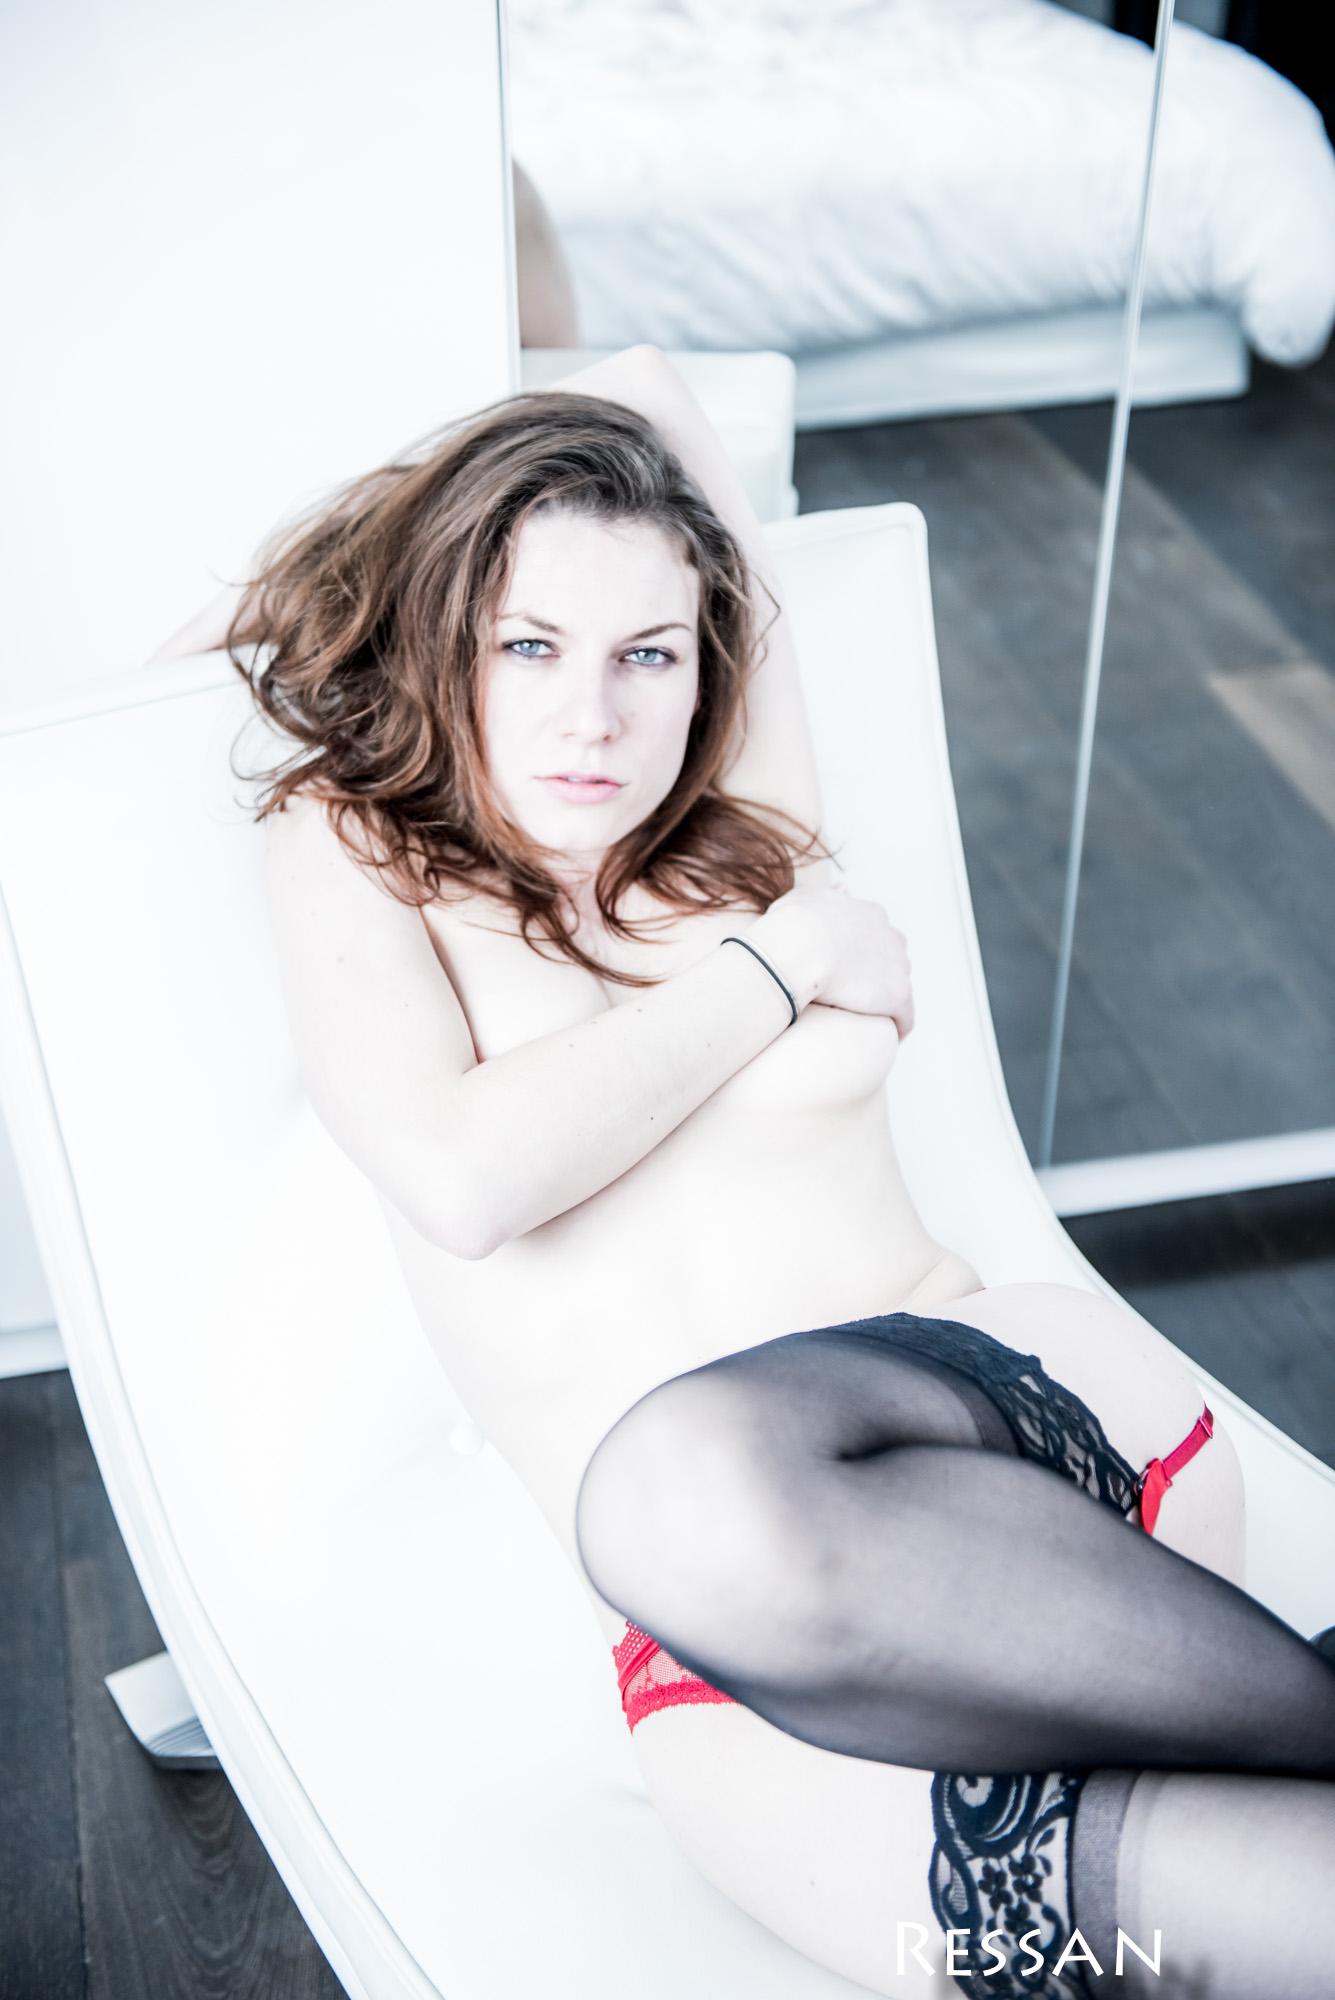 julie_Clo_fabian_mars2015-970